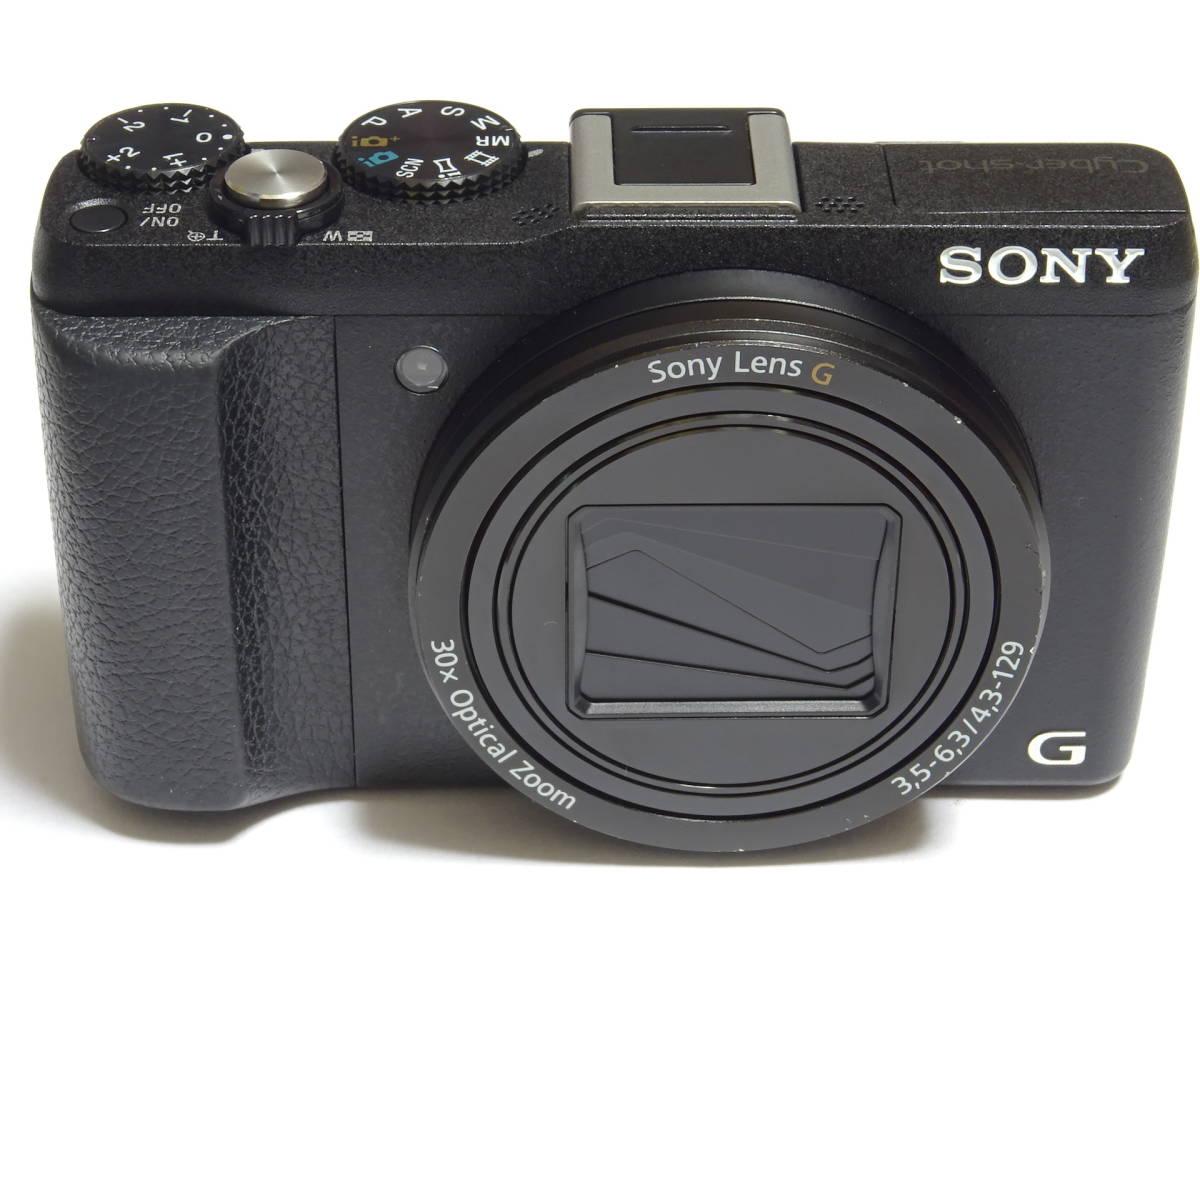 SONY Cyber-shot DSC-HX60V 2040万画素 光学30倍 Full HD 1080 60p 動画撮影 GPS Wi-Fi NFC 中古本体・箱・取説付き ☆動作品☆ 0899_画像3